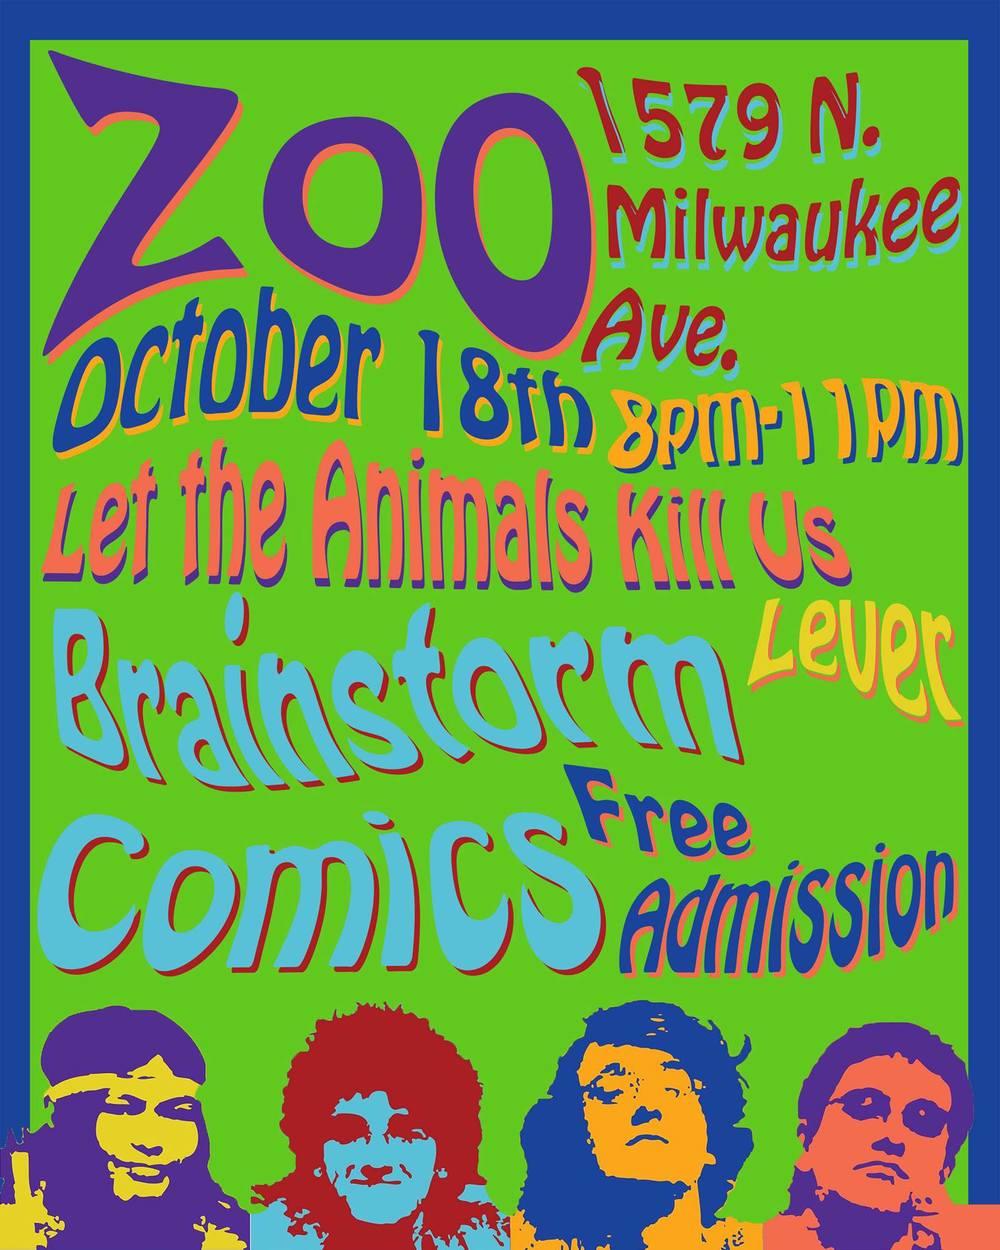 10/18/13 @ Brainstorm COMICS